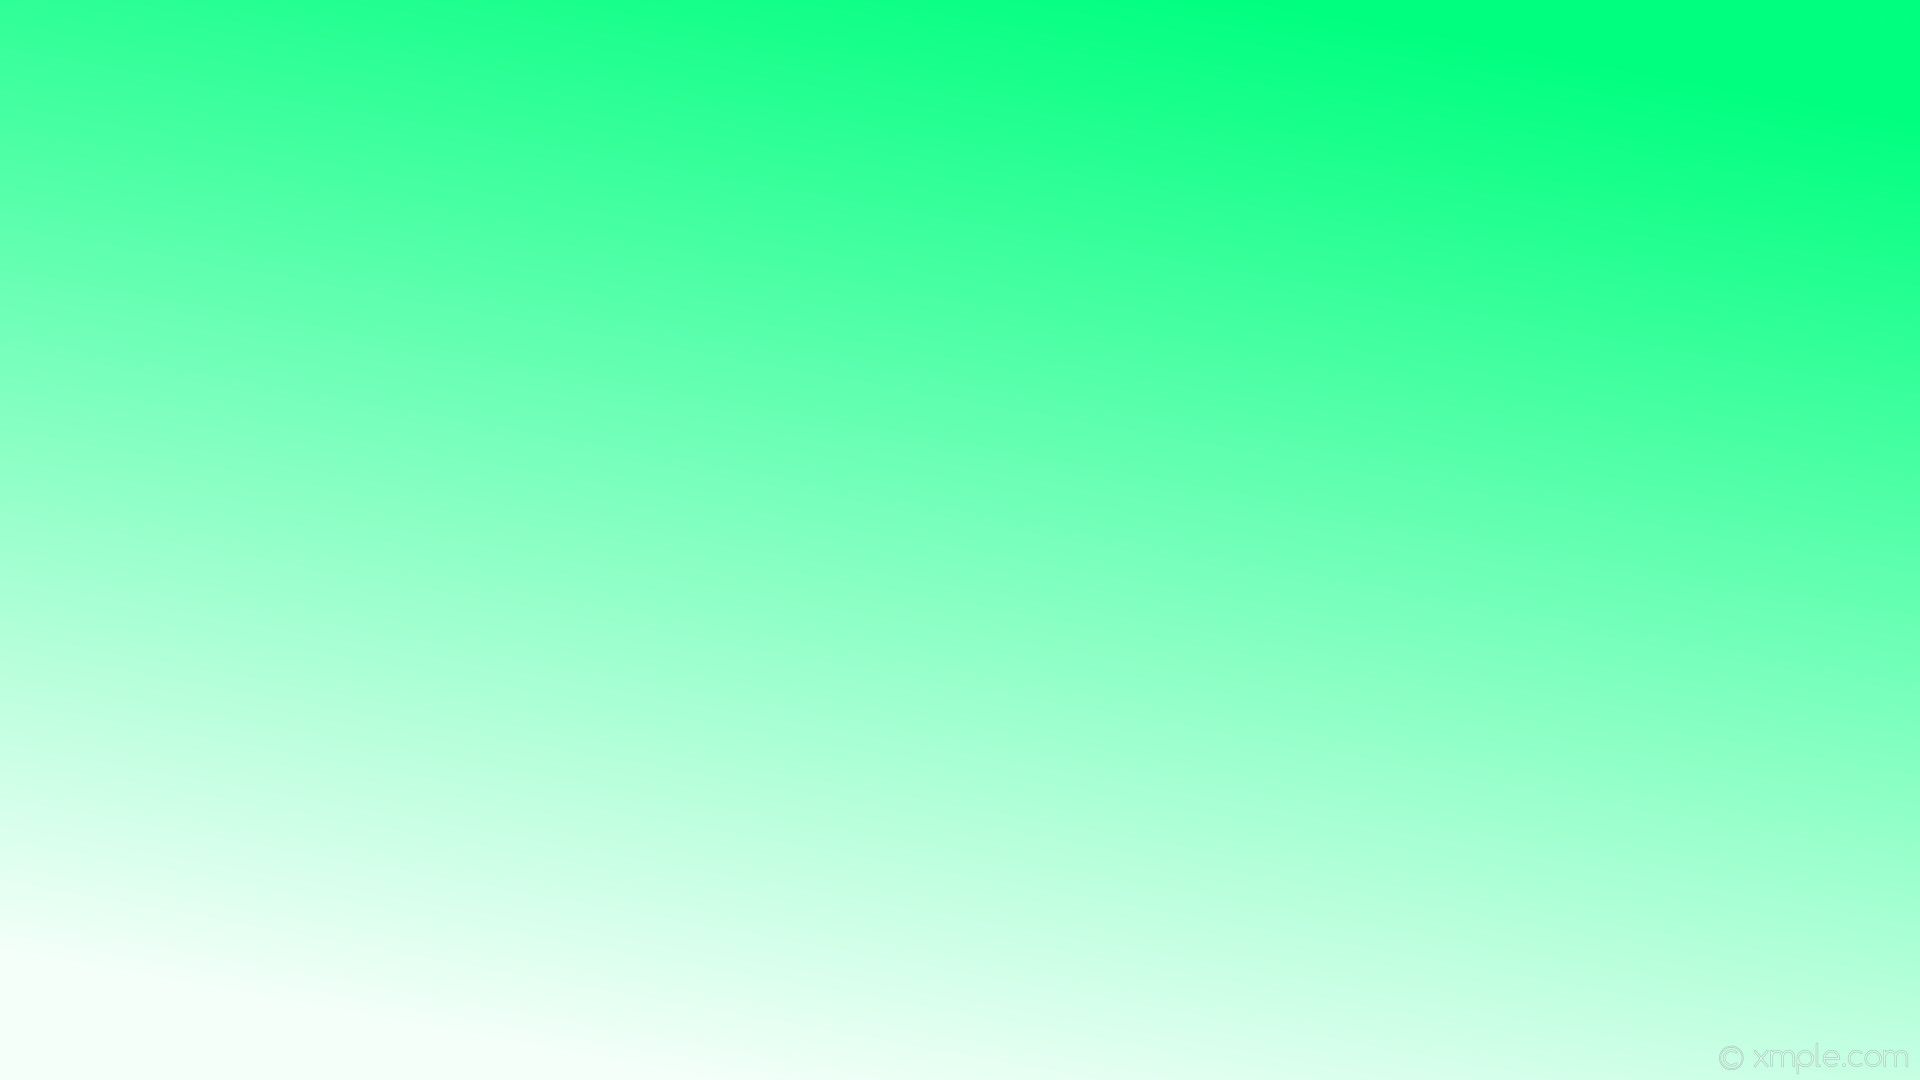 Mint Green Wallpaper (54+ images)